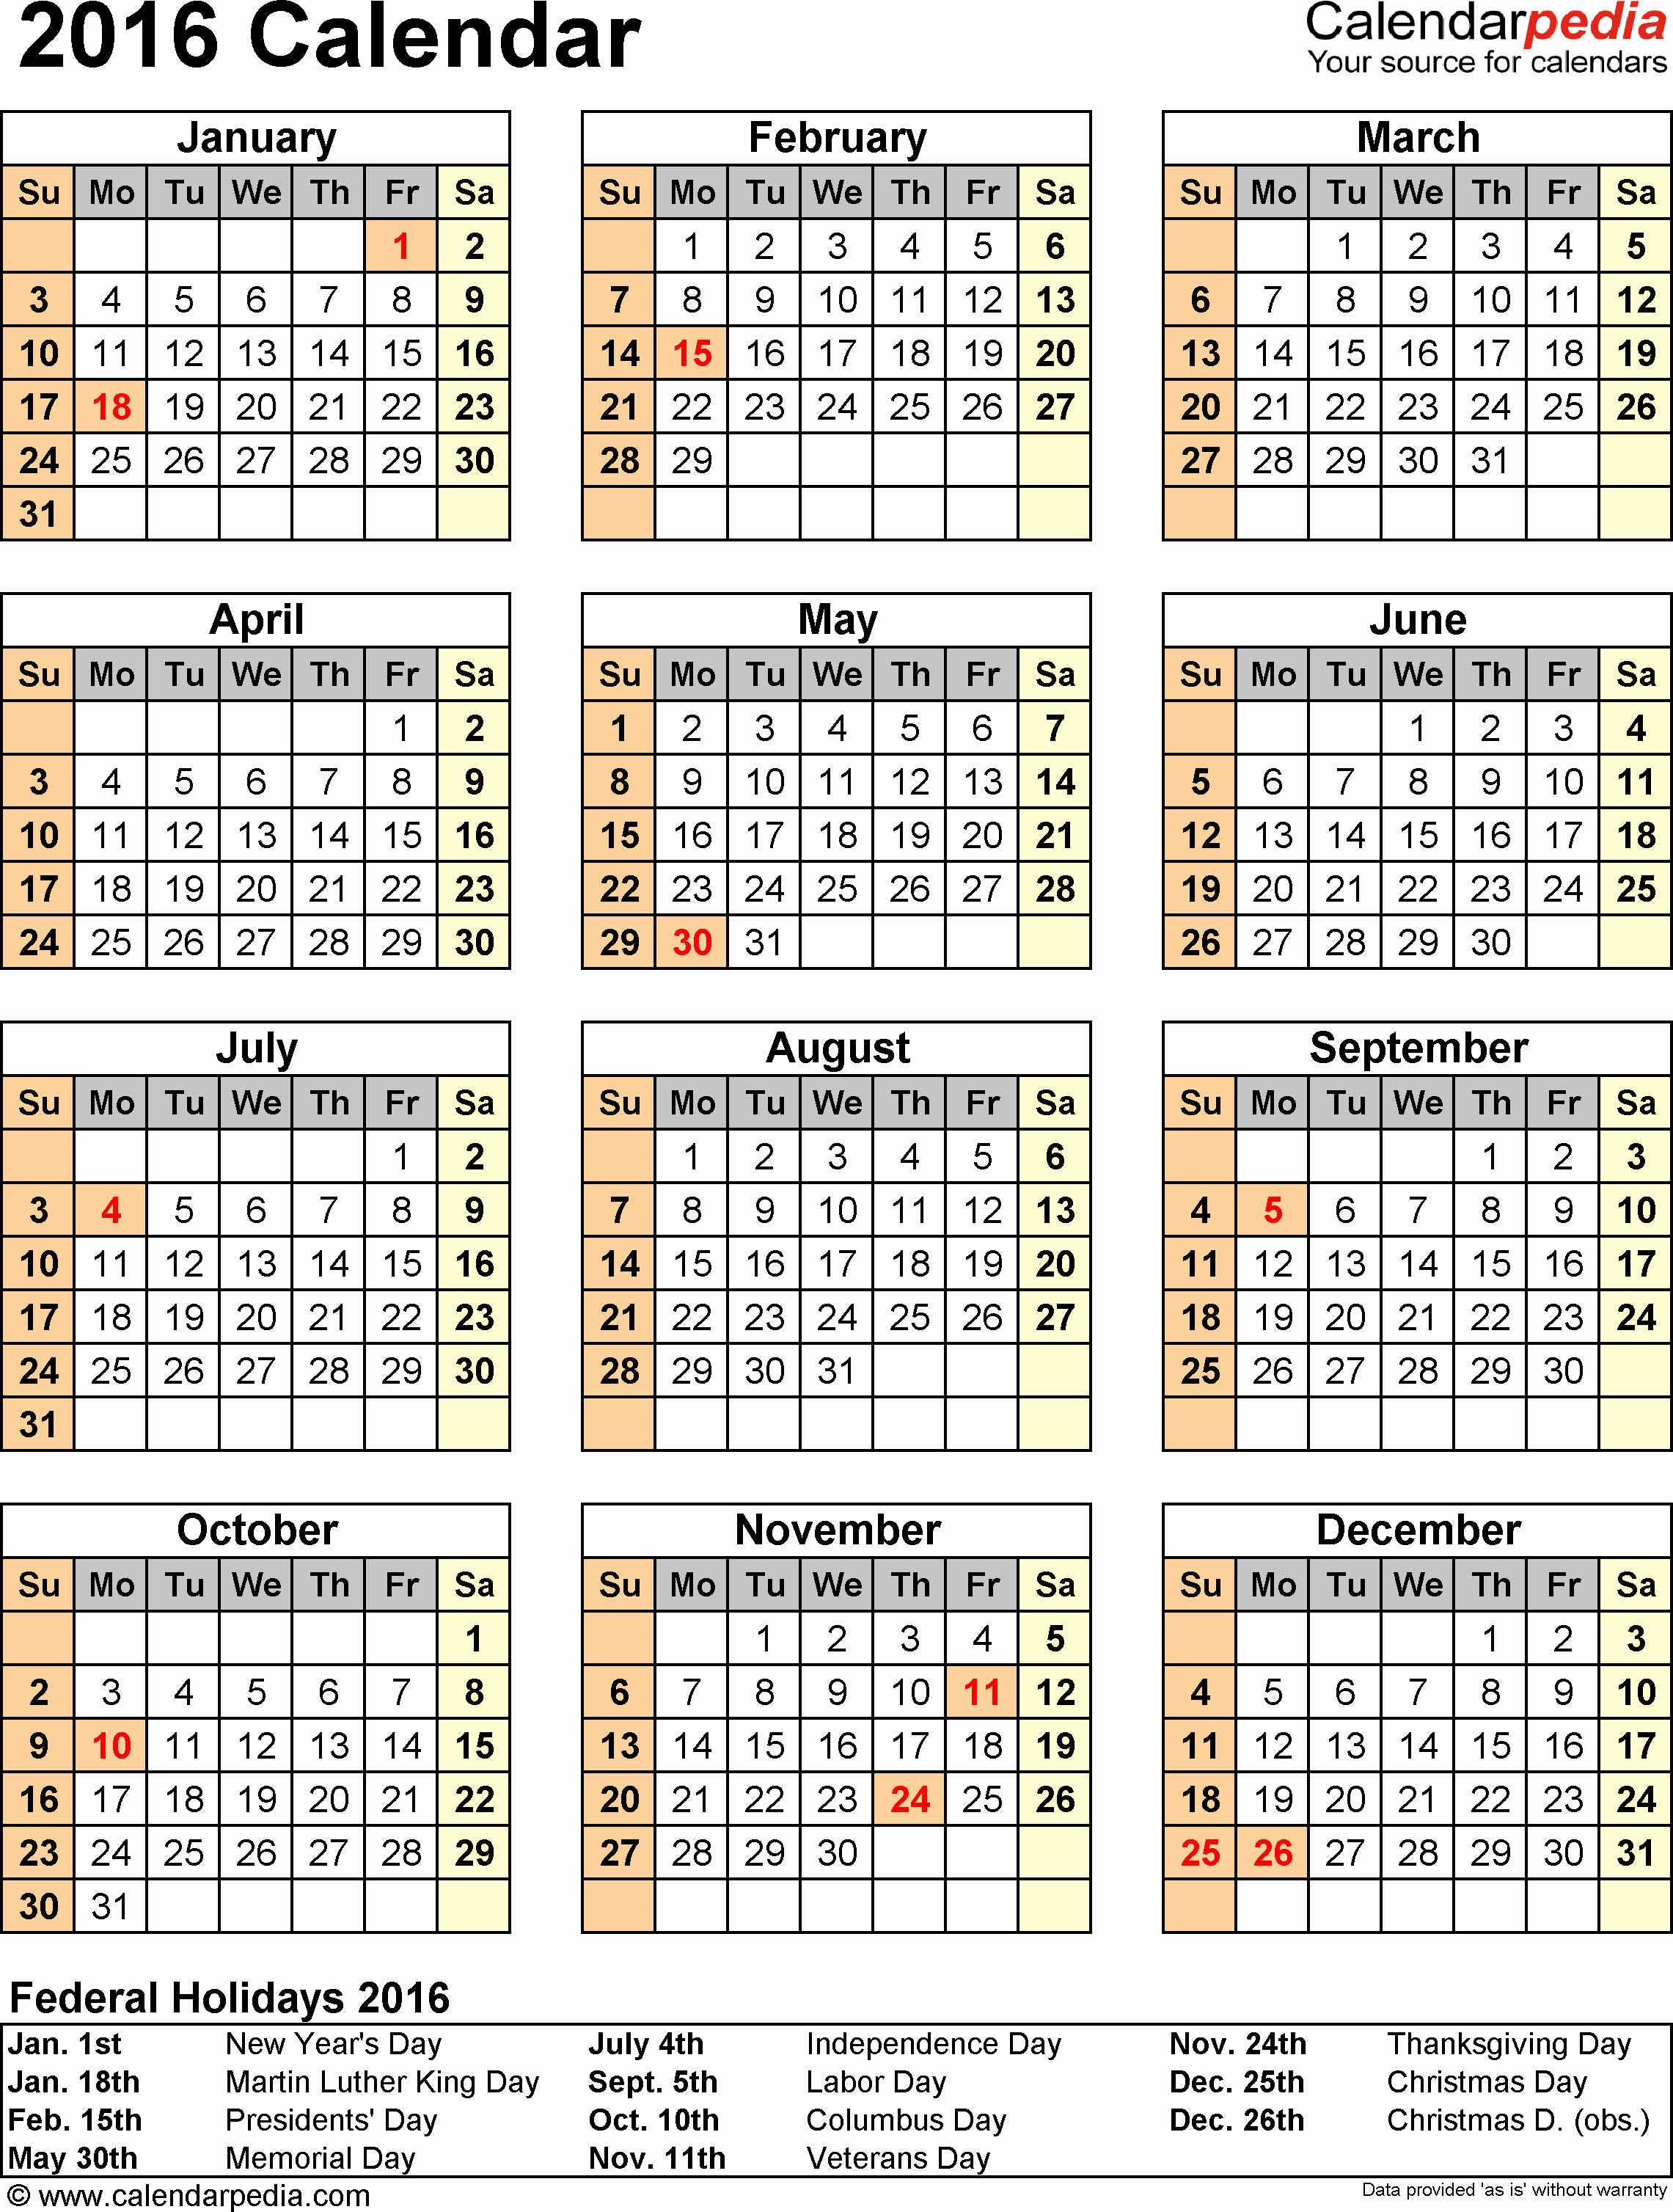 Free Year Calendar Template 2016 Unique 2016 Calendar Pdf 16 Free Printable Calendar Templates